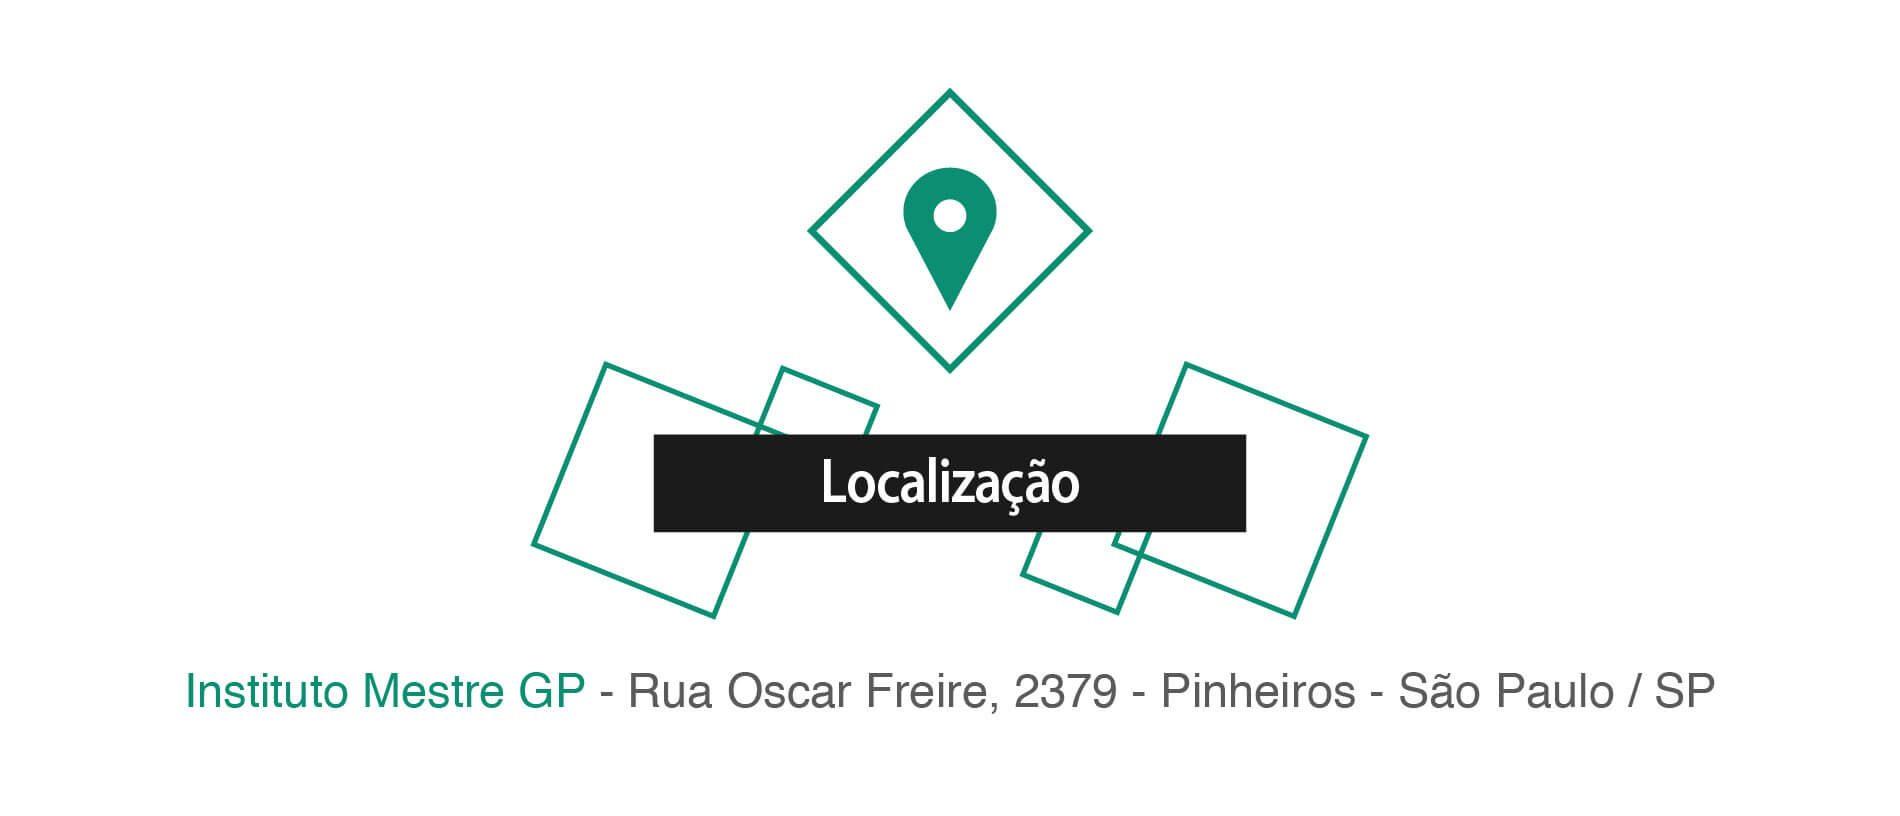 https://www.mestregp.com.br/wp-content/uploads/2018/01/Pagina-Meeting-Project-Local-1900x816.jpg